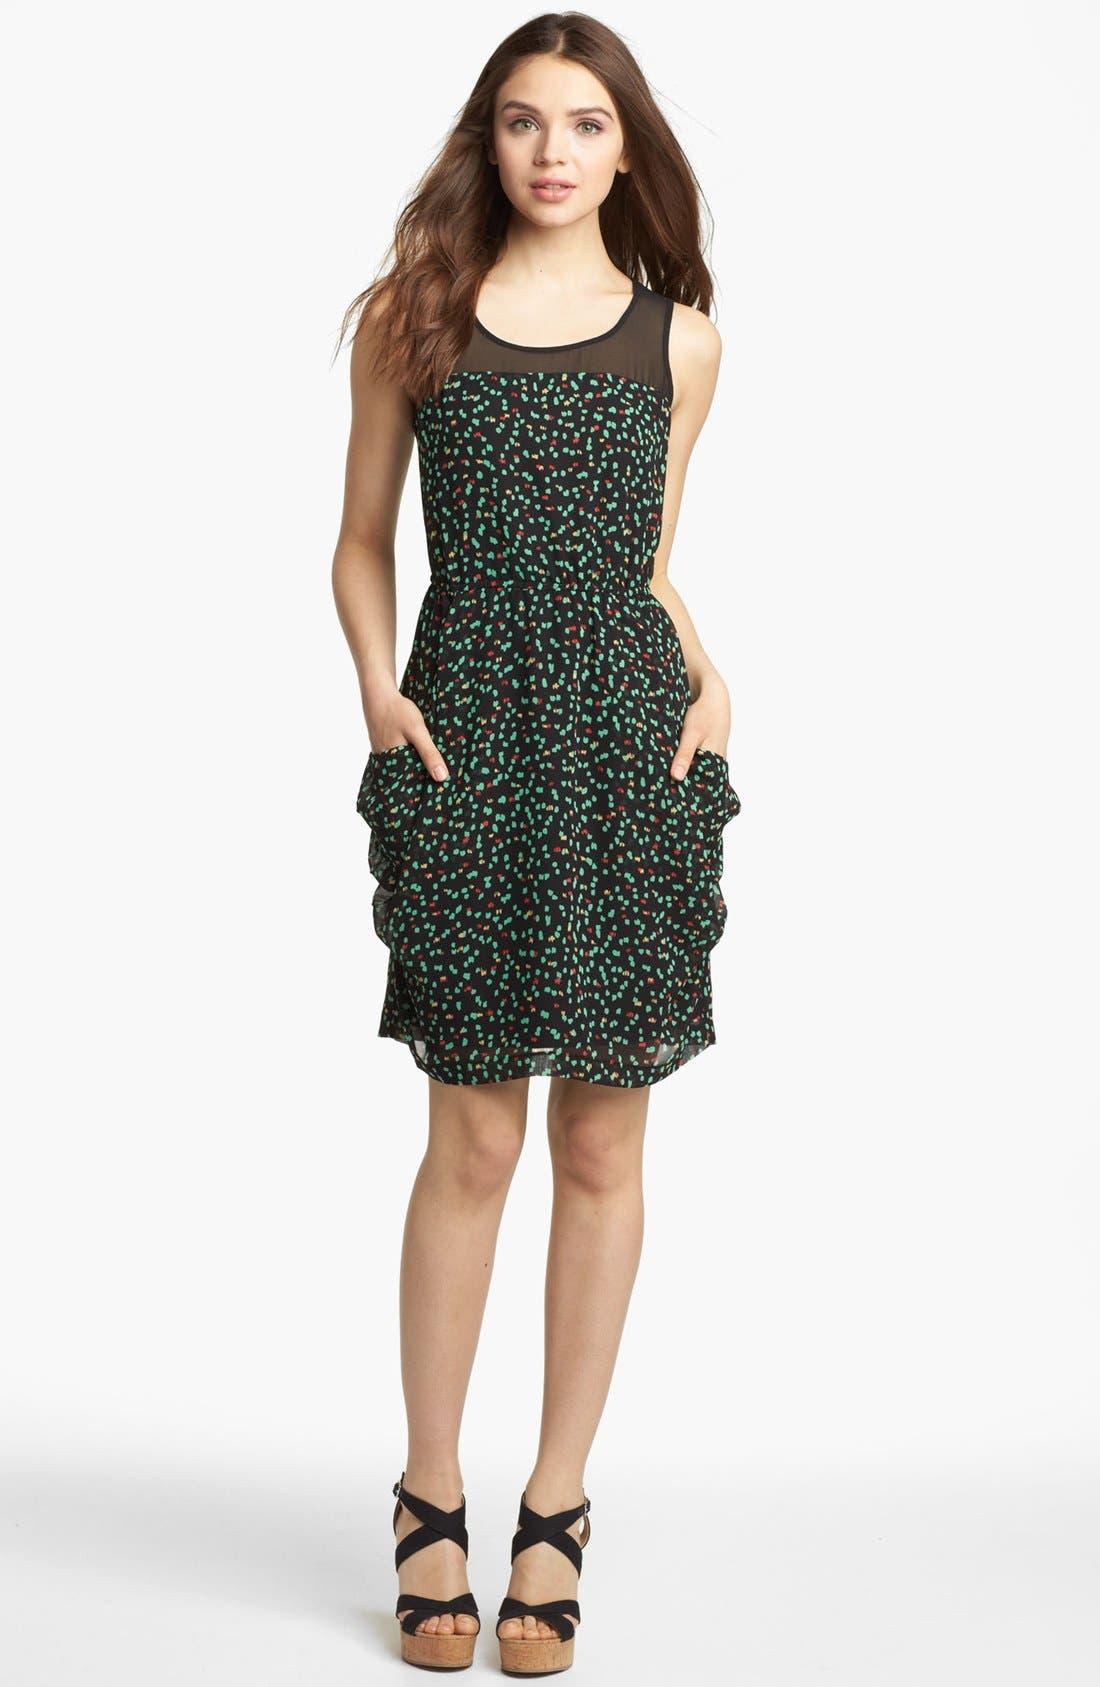 Main Image - Kensie 'Sketched Spot' Dress